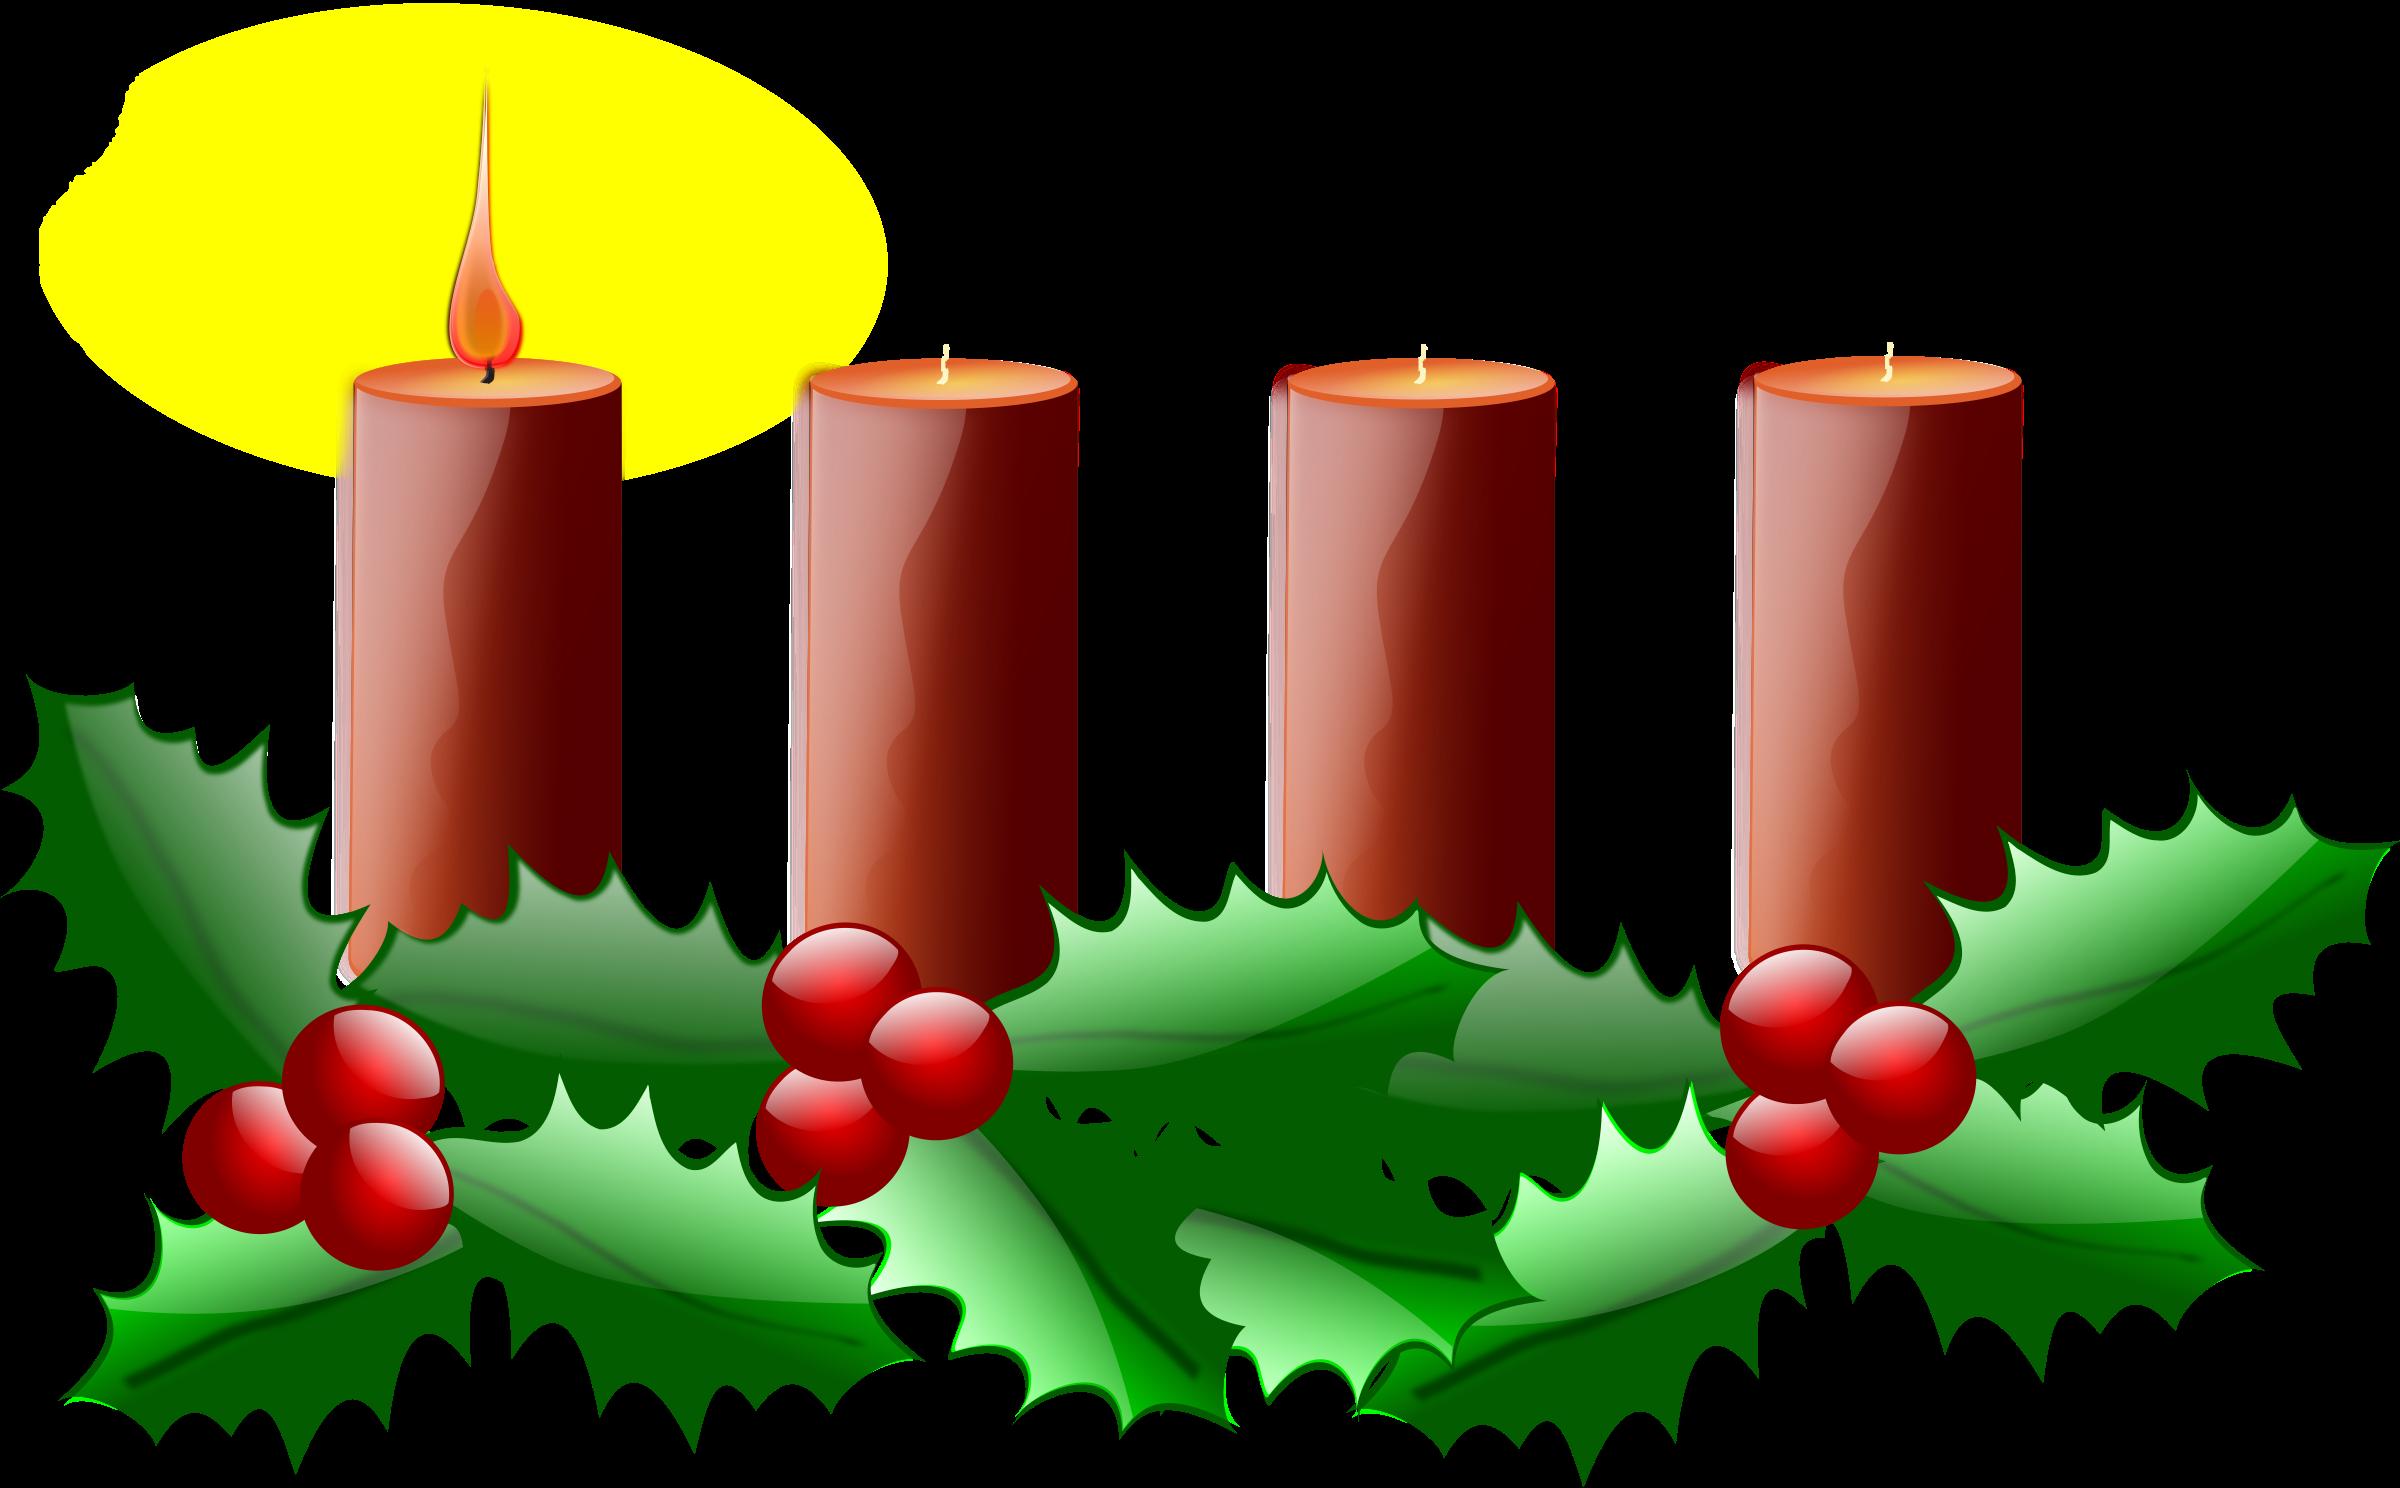 2400x1488 Advent Wreath Clipart Free 101 Clip Art